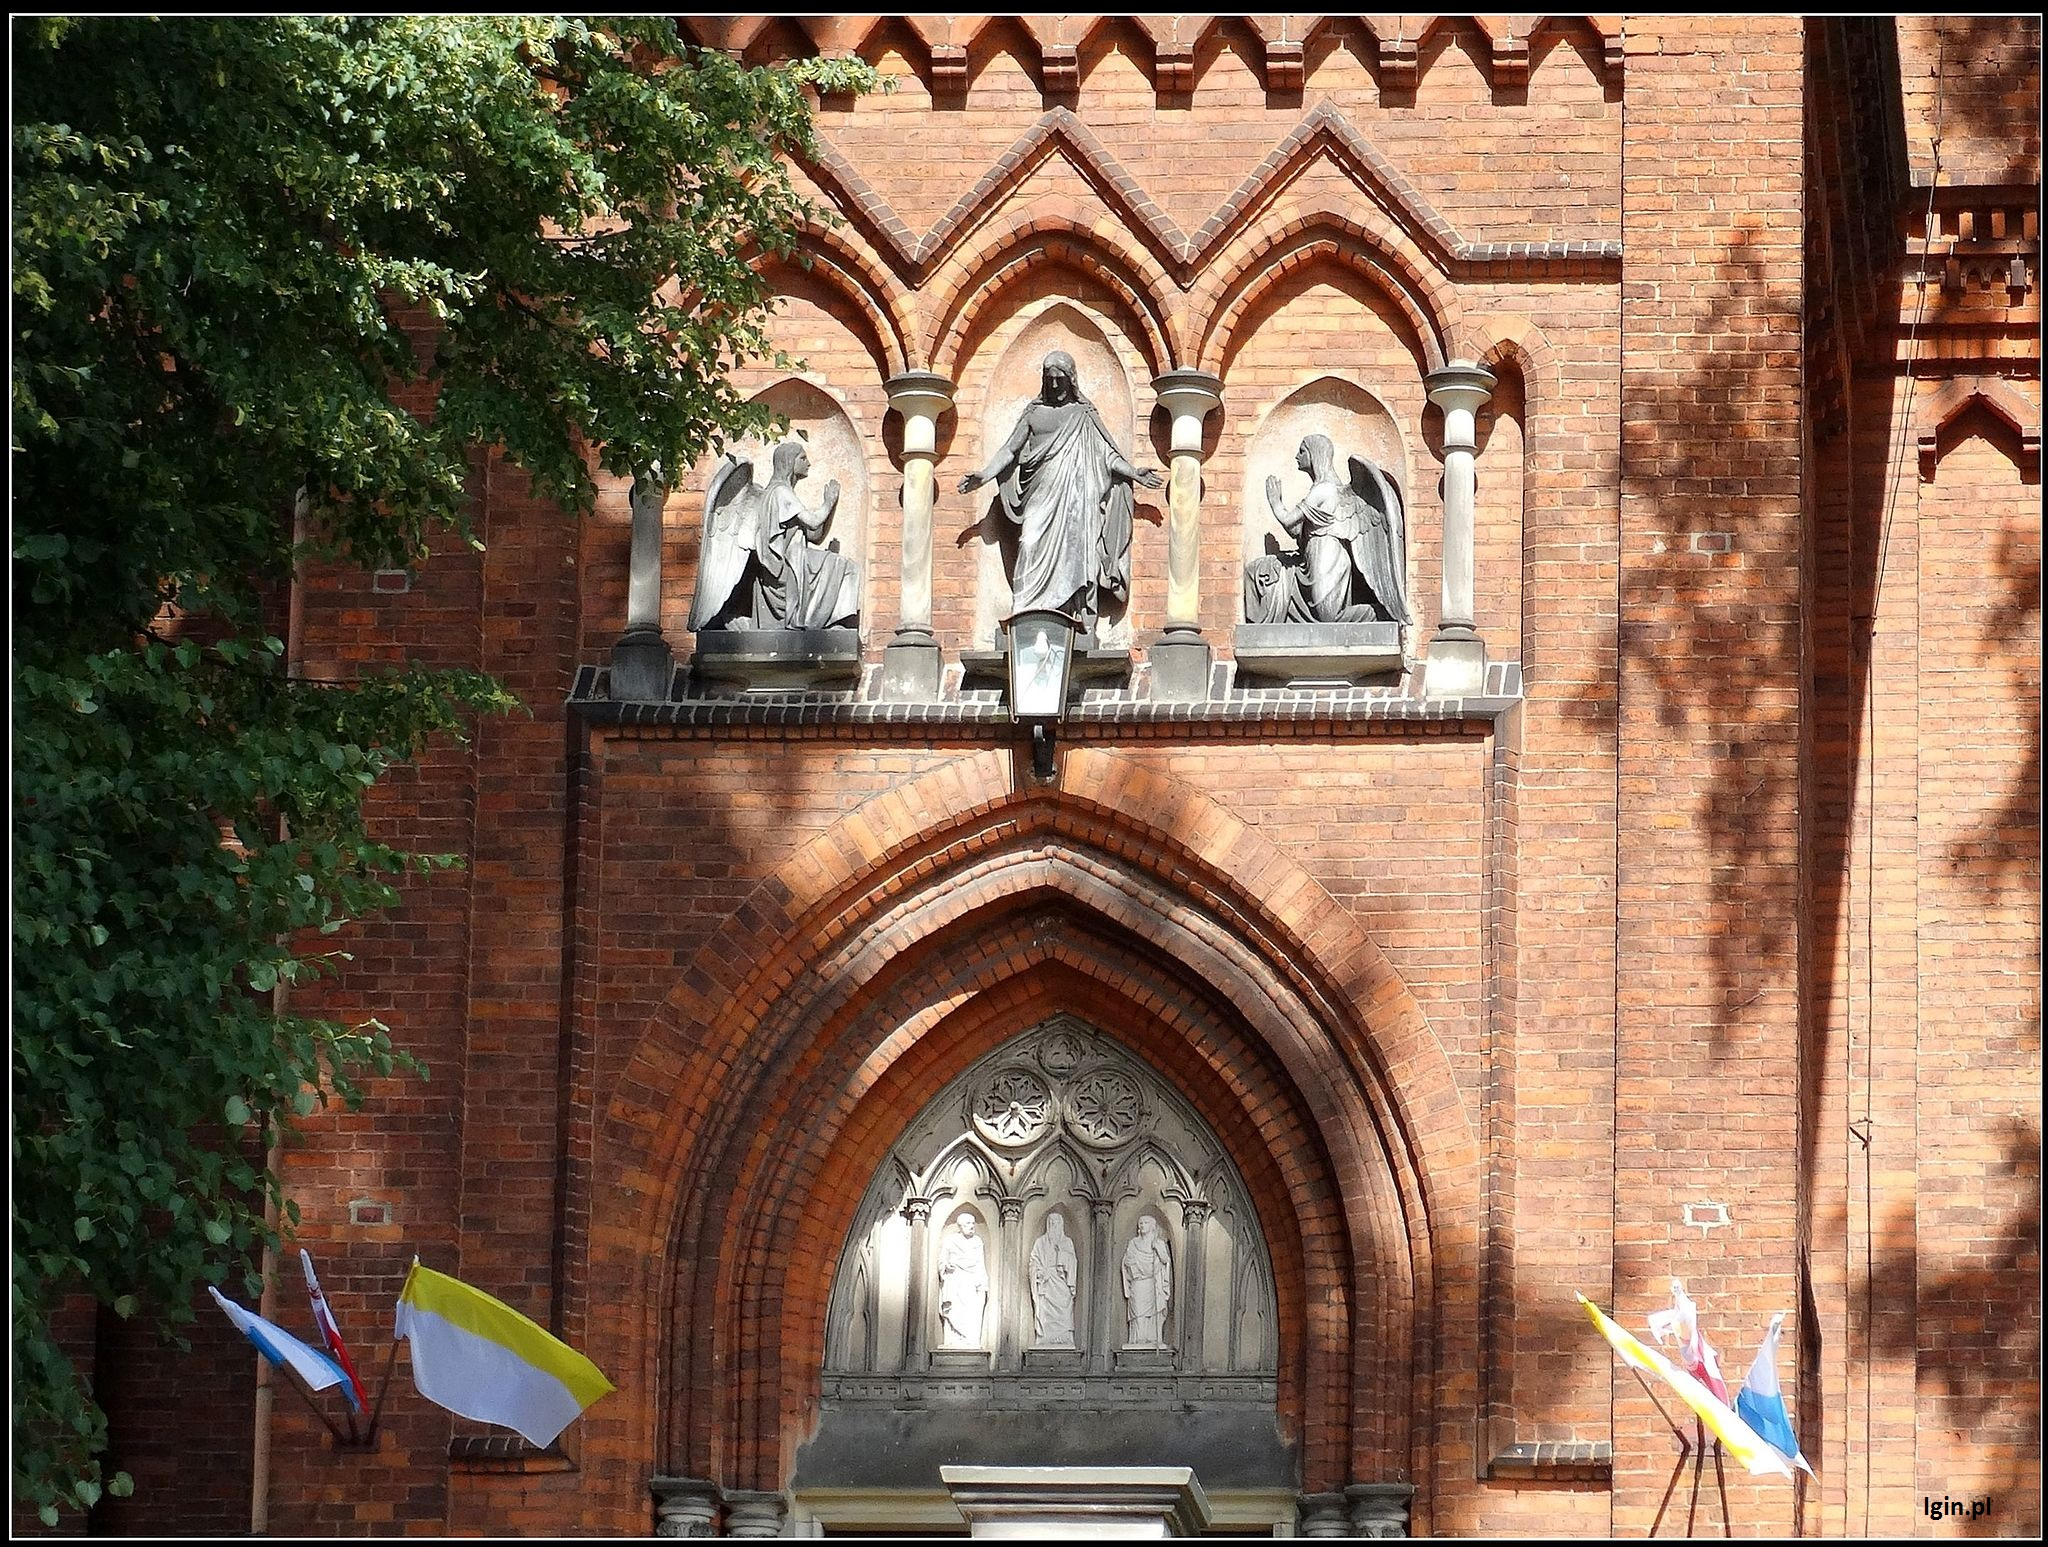 H.16.0388_-_Lgiń_kościół